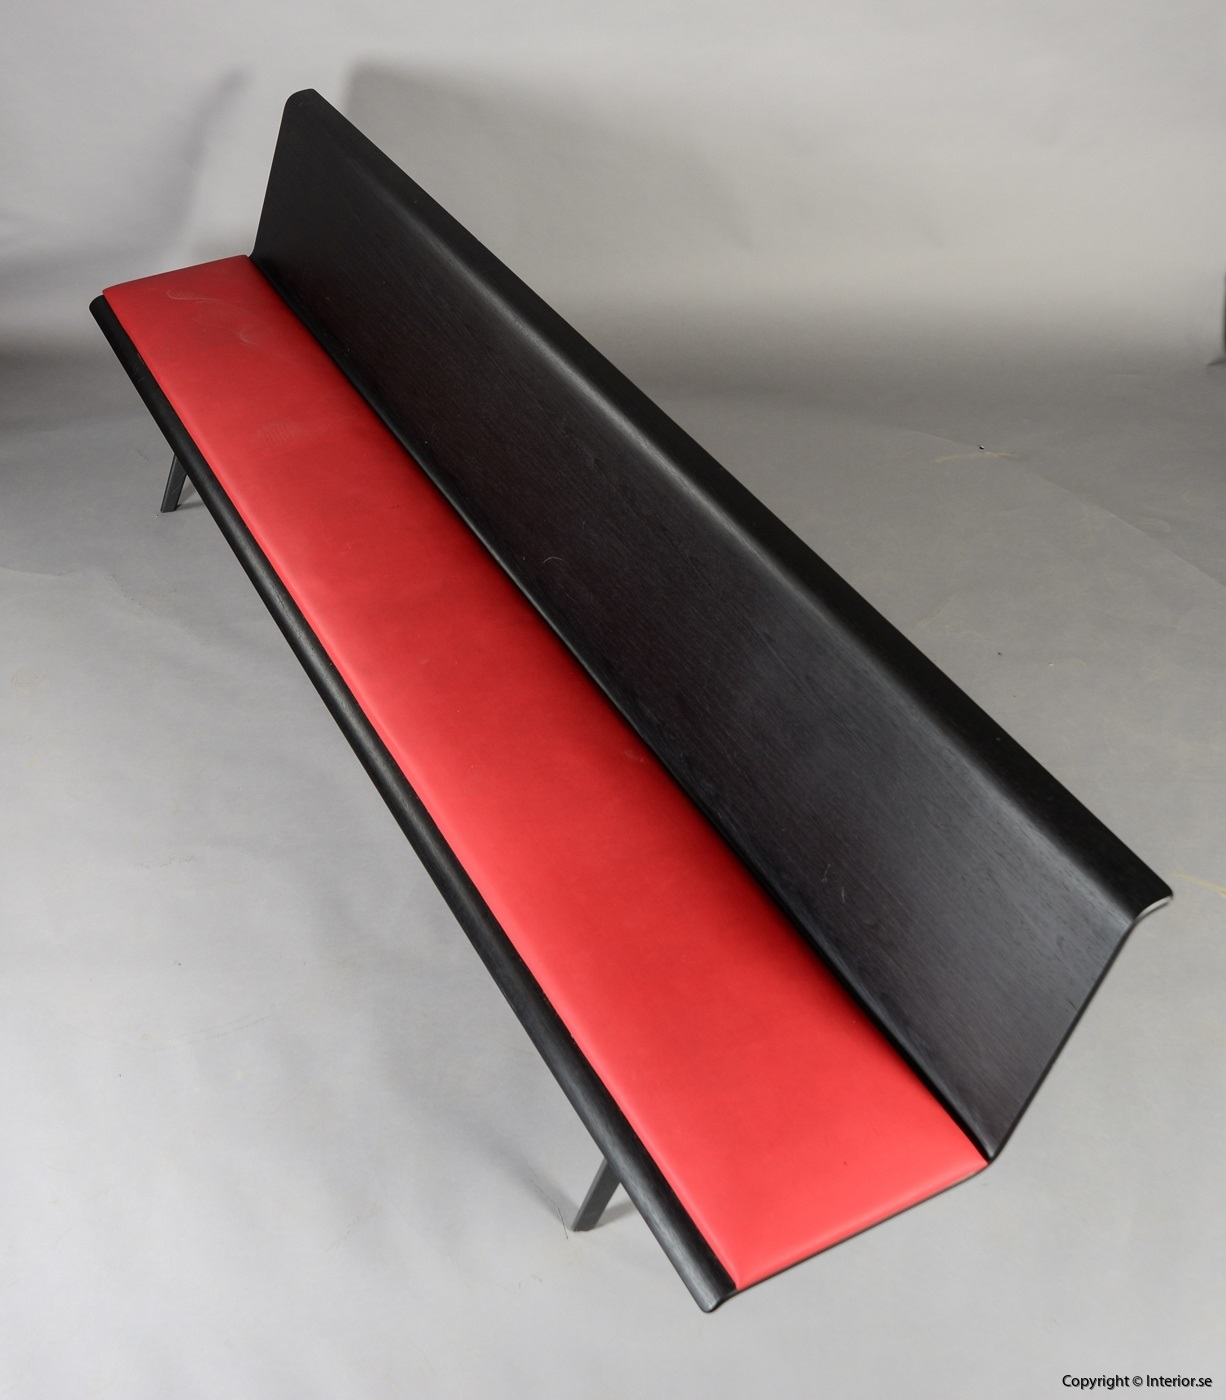 1 Lievore Altherr Molina  Arper Zinta sofa bench Design Furniture (7)